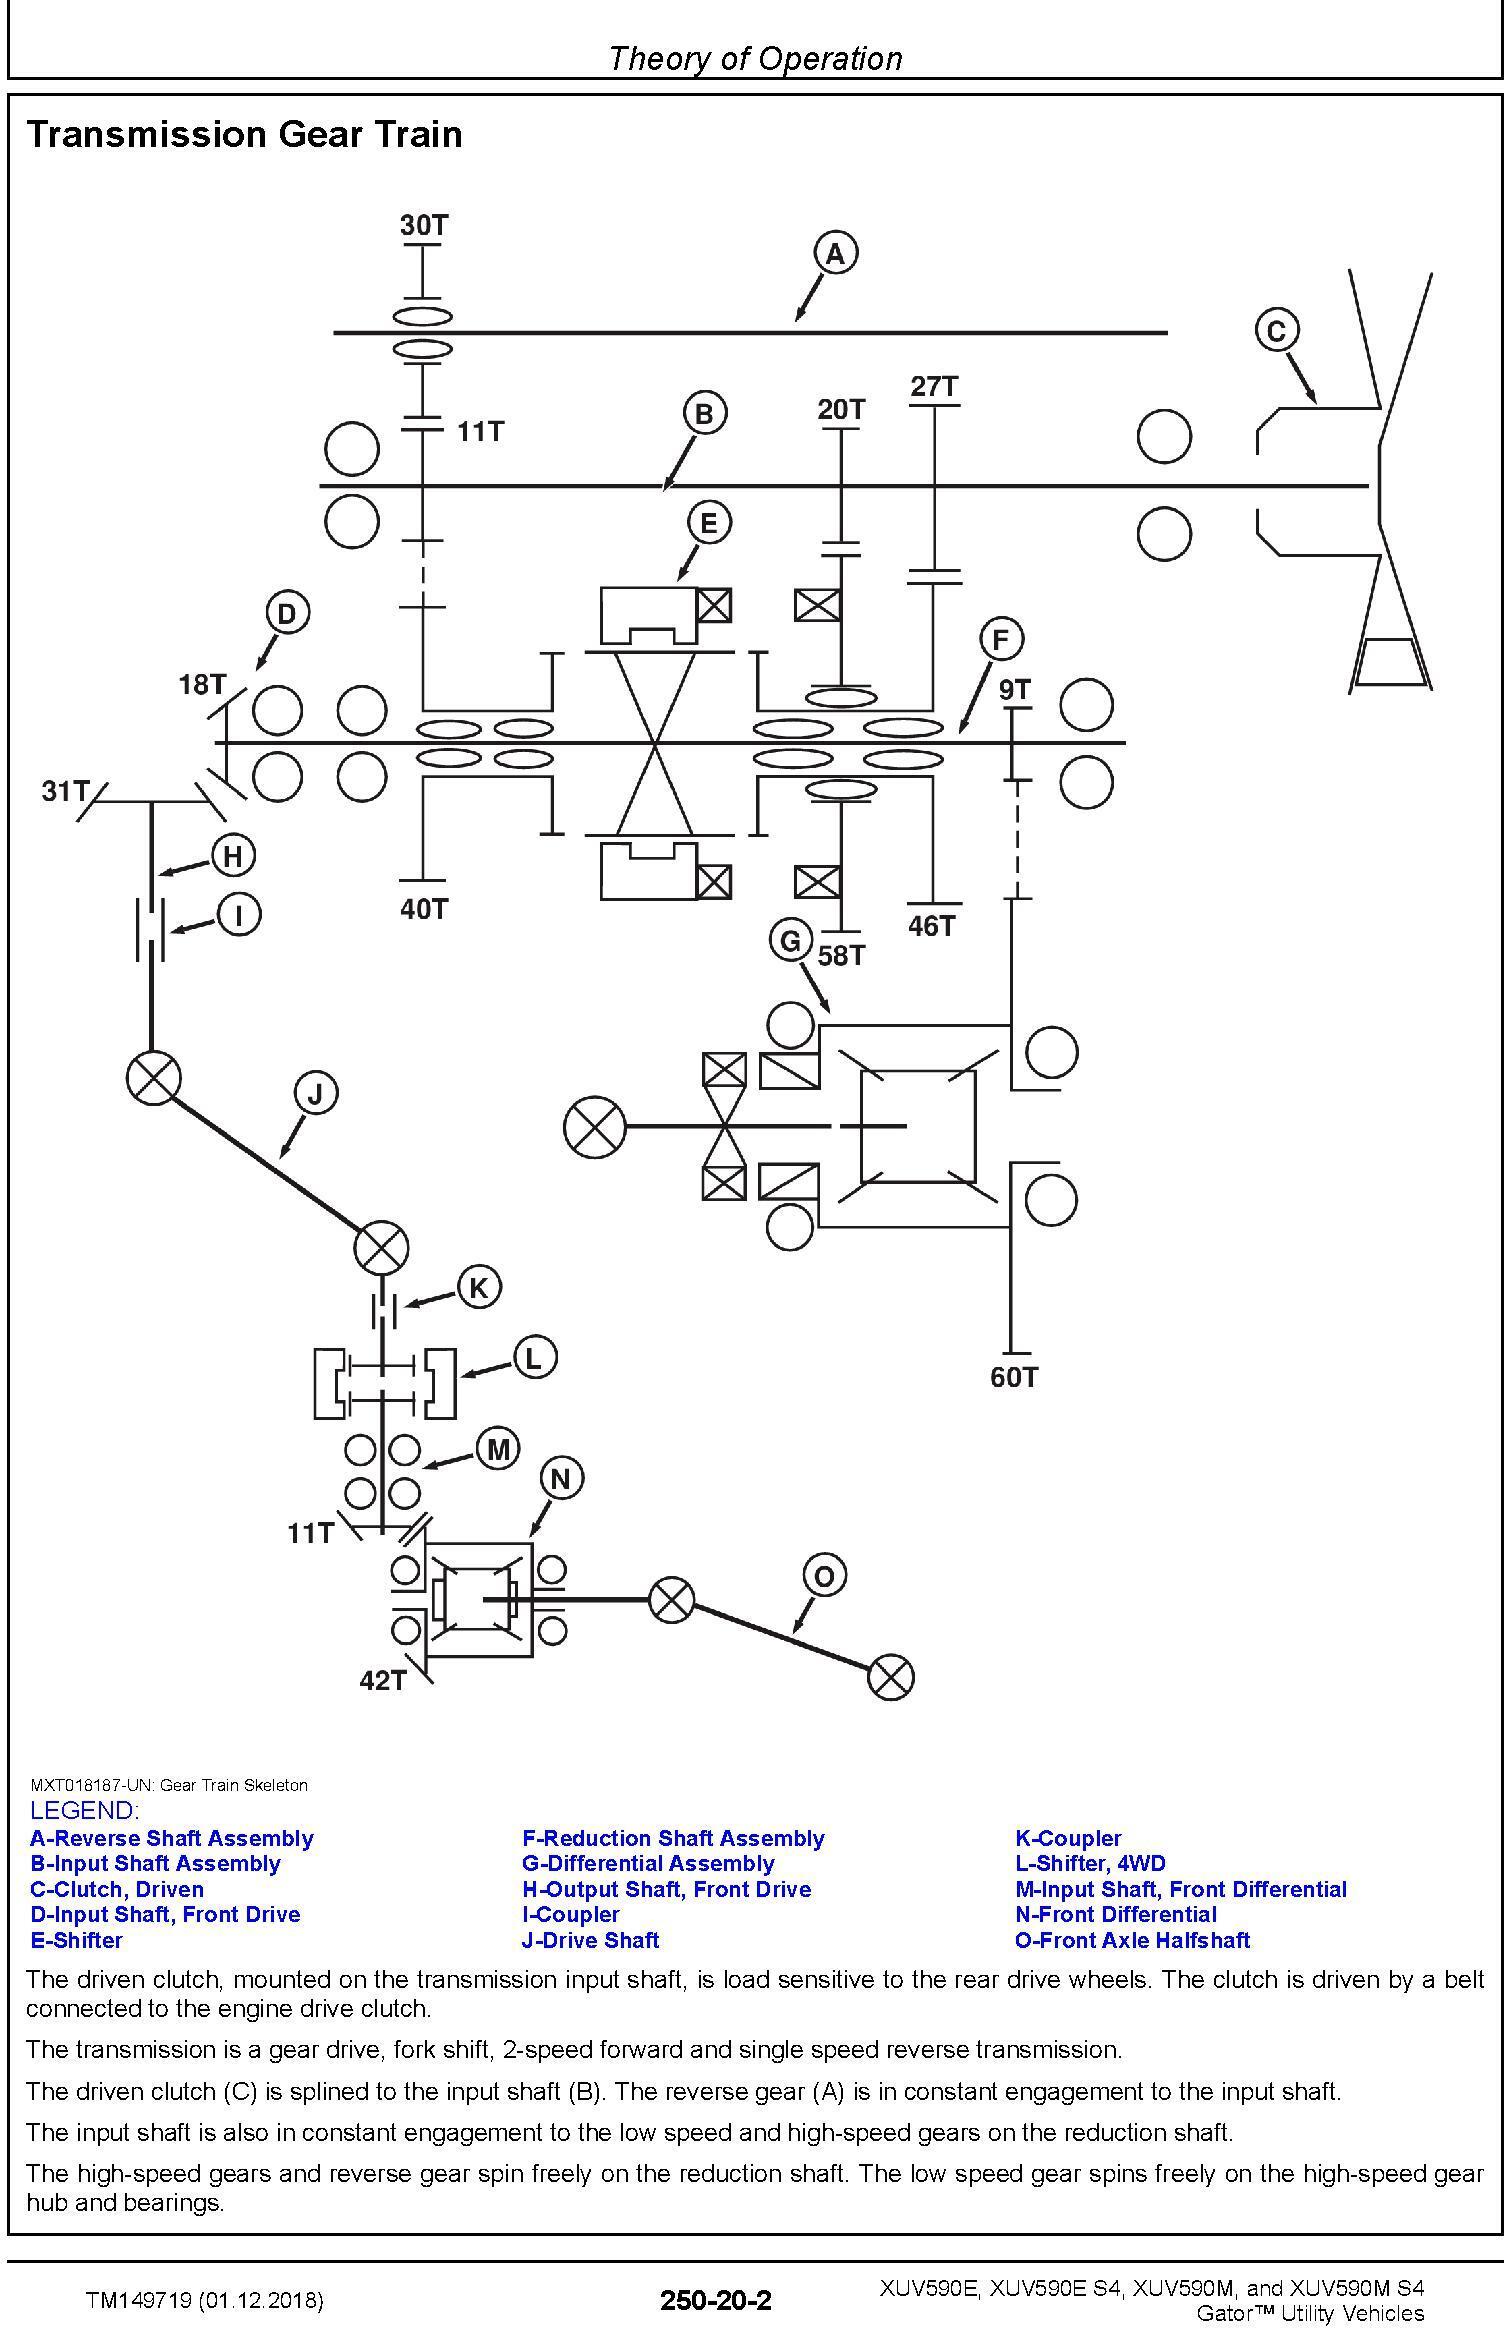 John Deere XUV590E(S4), XUV590E(S4) Gator Utility Vehicles (SN. 010001-) Technical Manual (TM149719) - 2